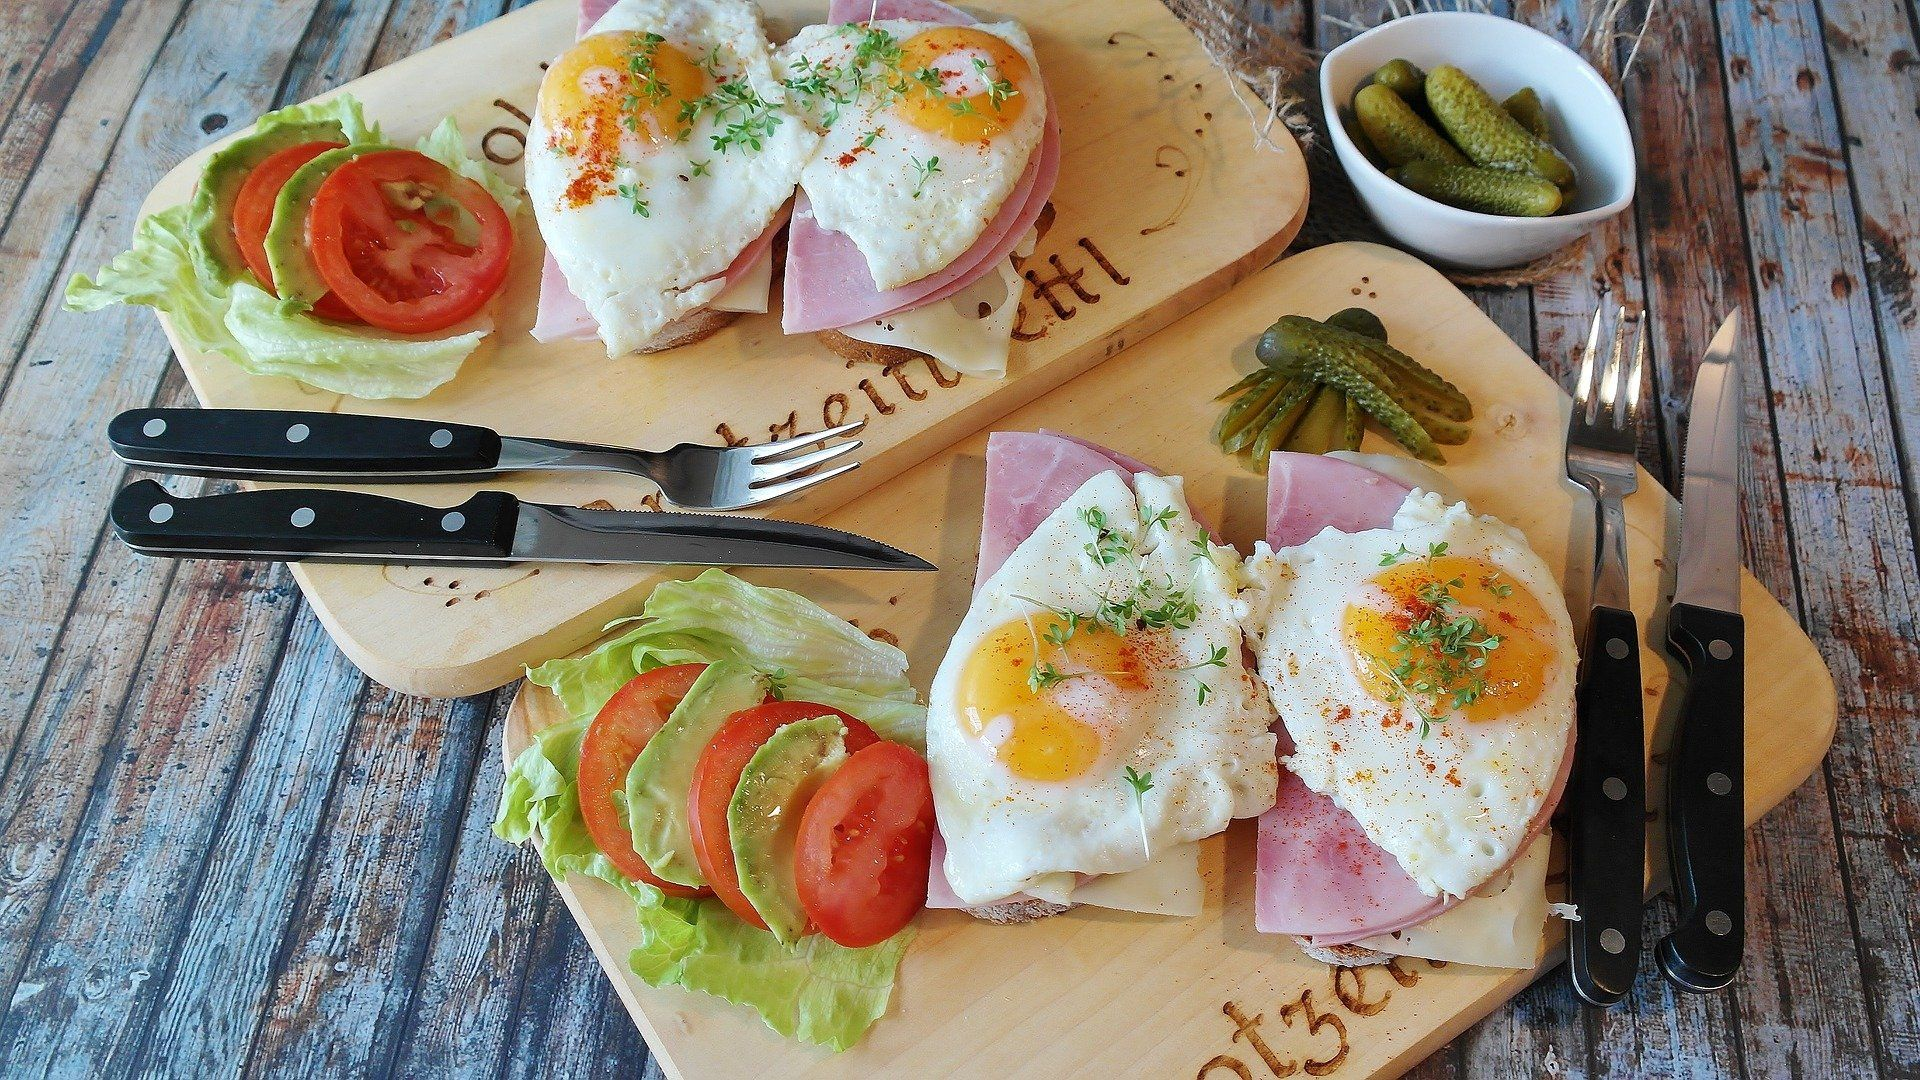 Gorduras boas — ovos